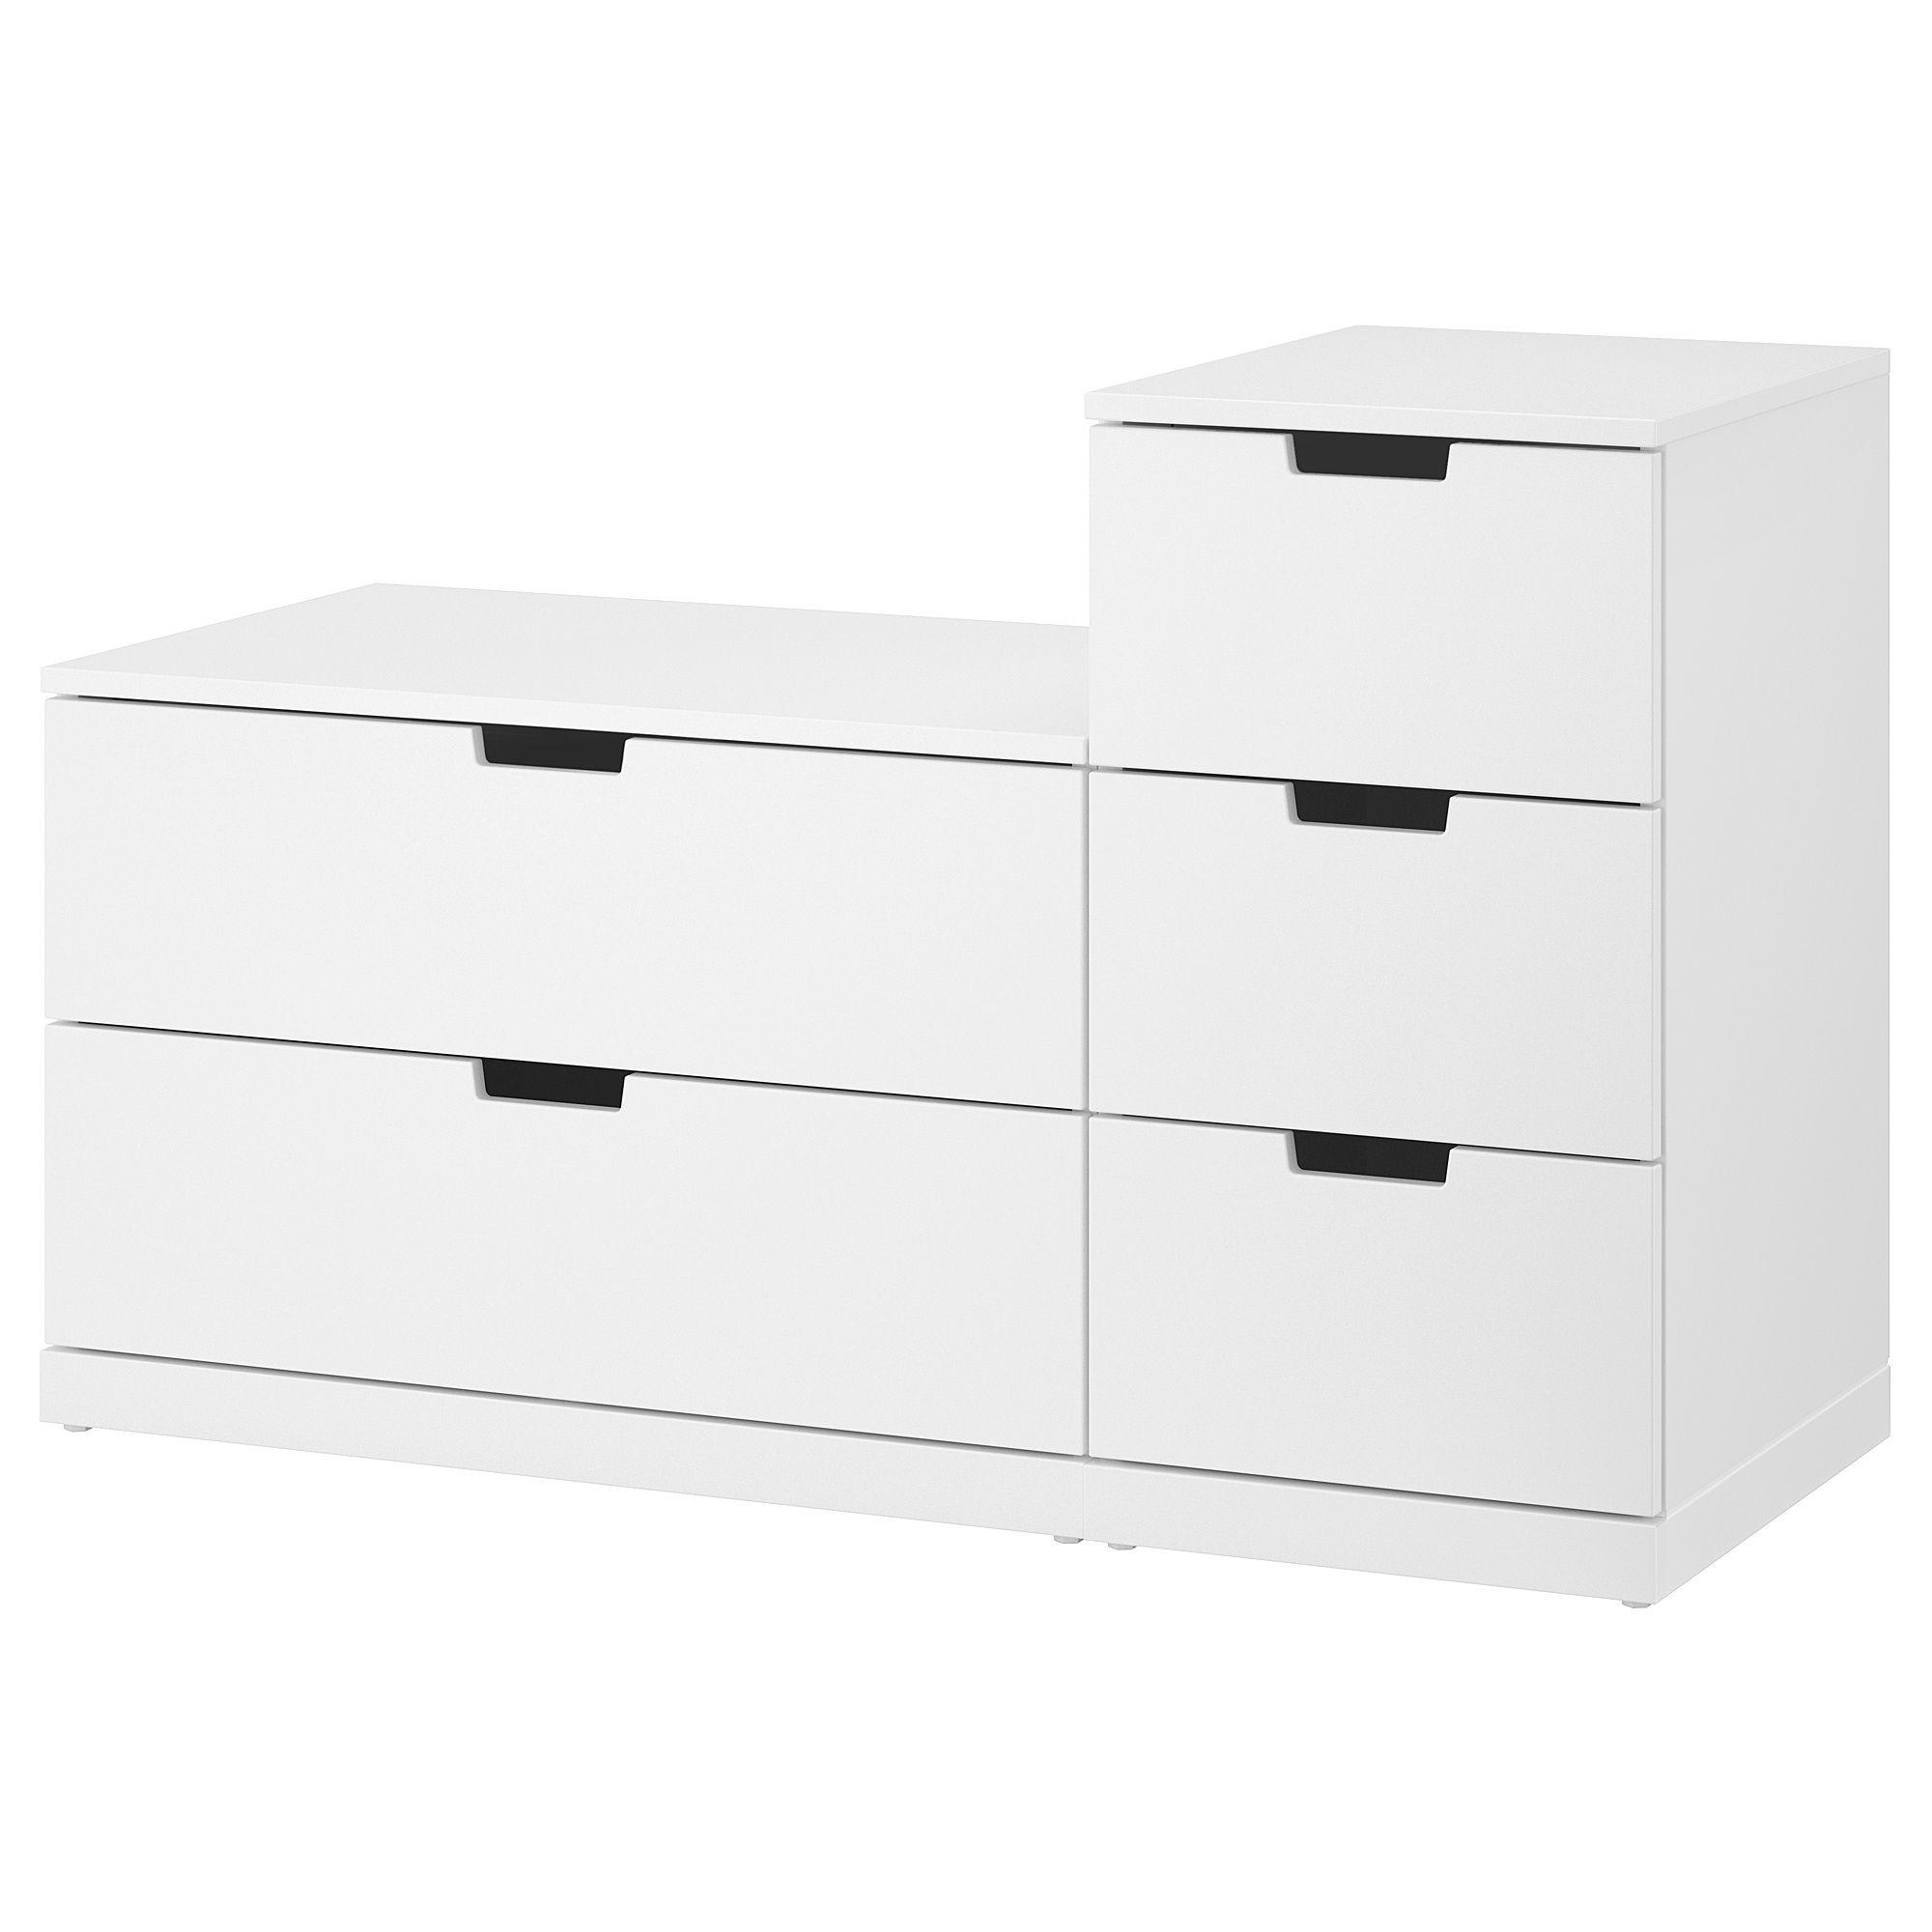 Nordli 5 Drawer Chest White 47 1 4x29 7 8 120x76 Cm Commode 5 Tiroirs Commode Ikea